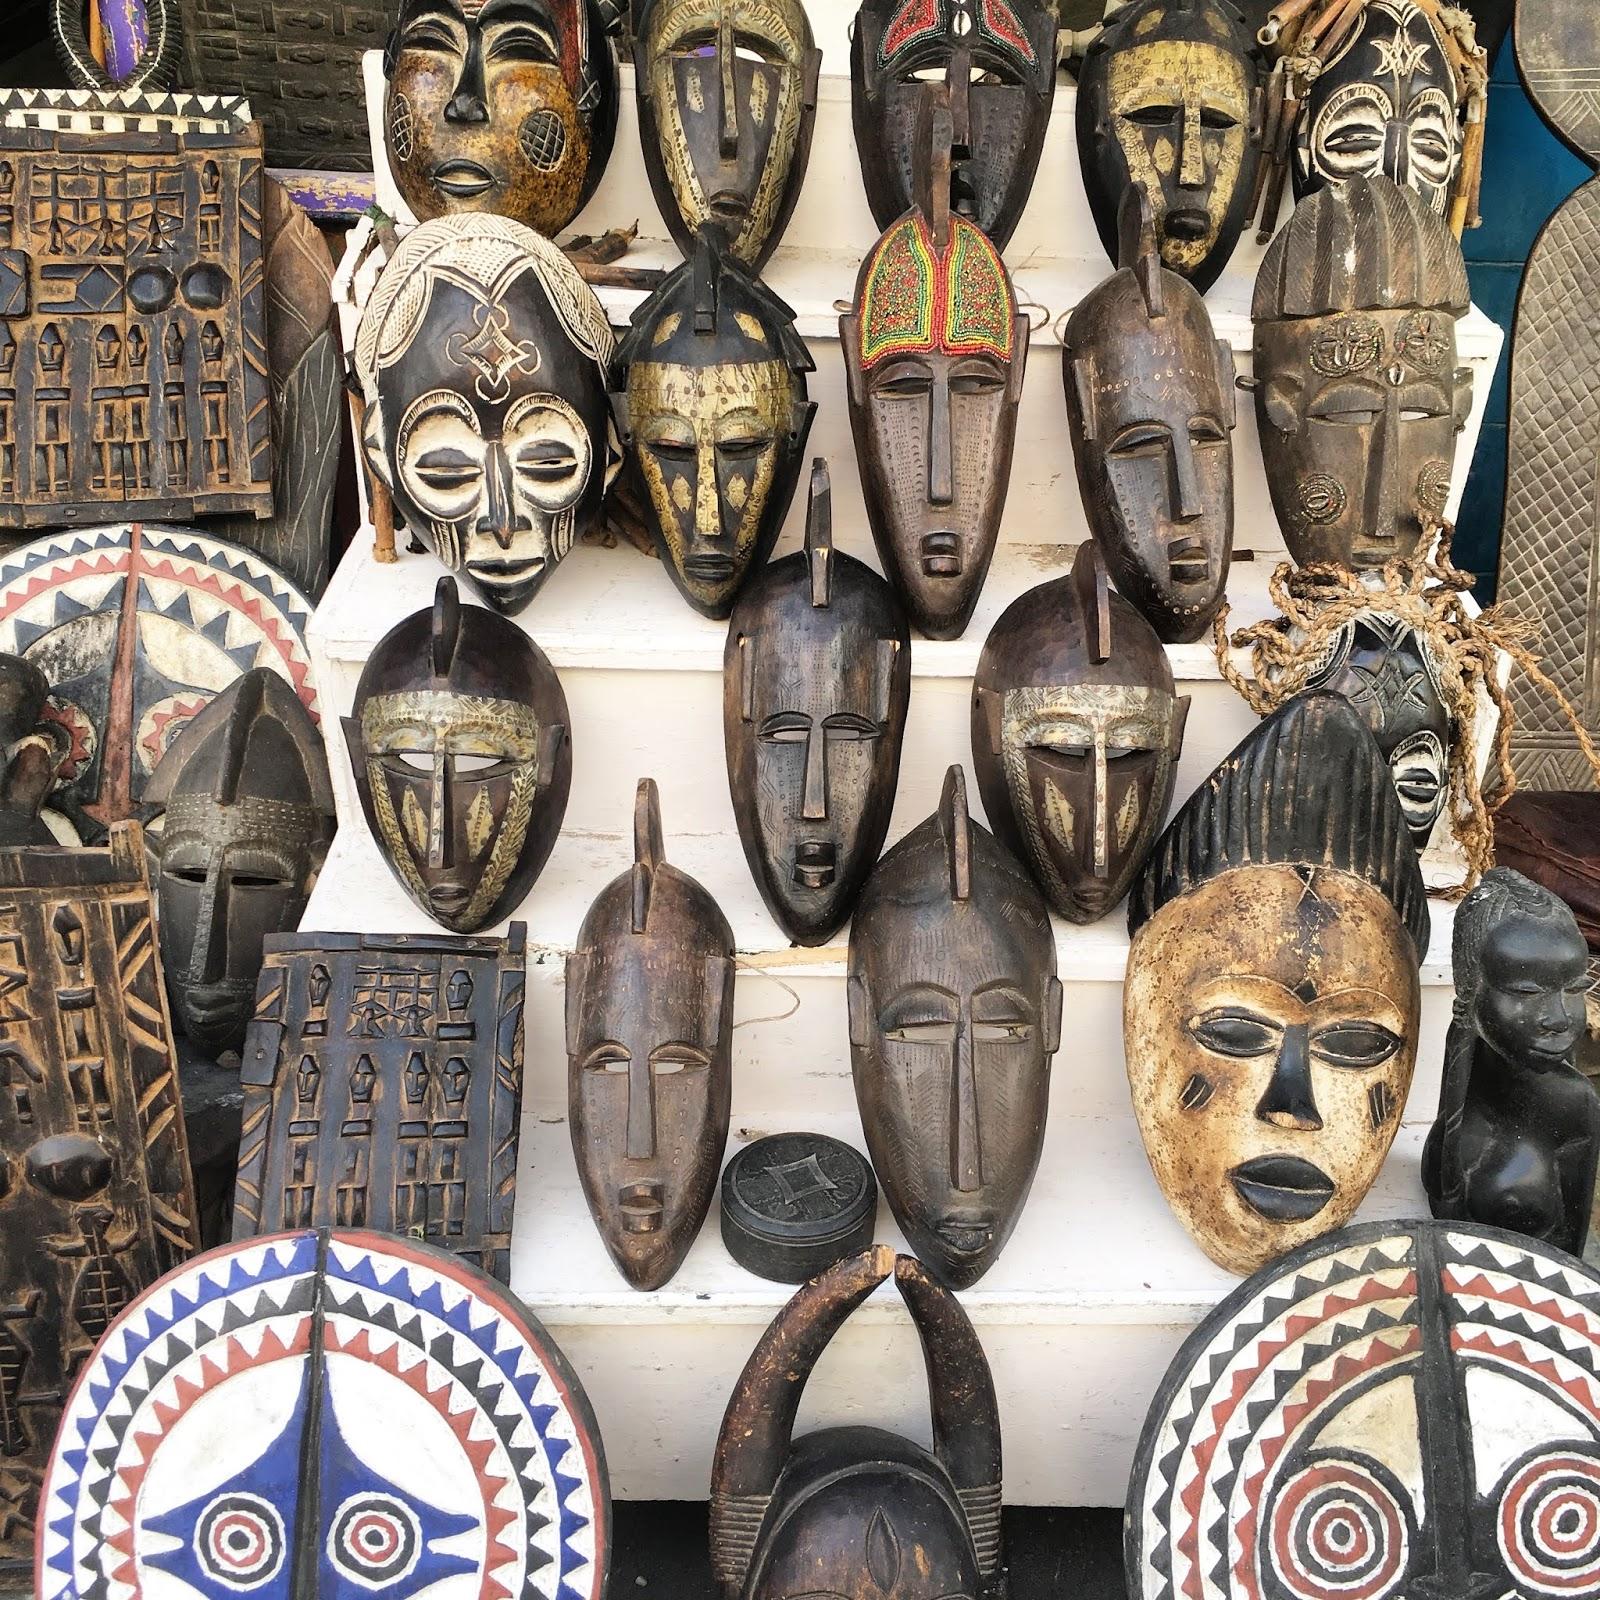 Africa, Morocco Marrakech, coco-morocco, interiorsourcing, interiortherapy